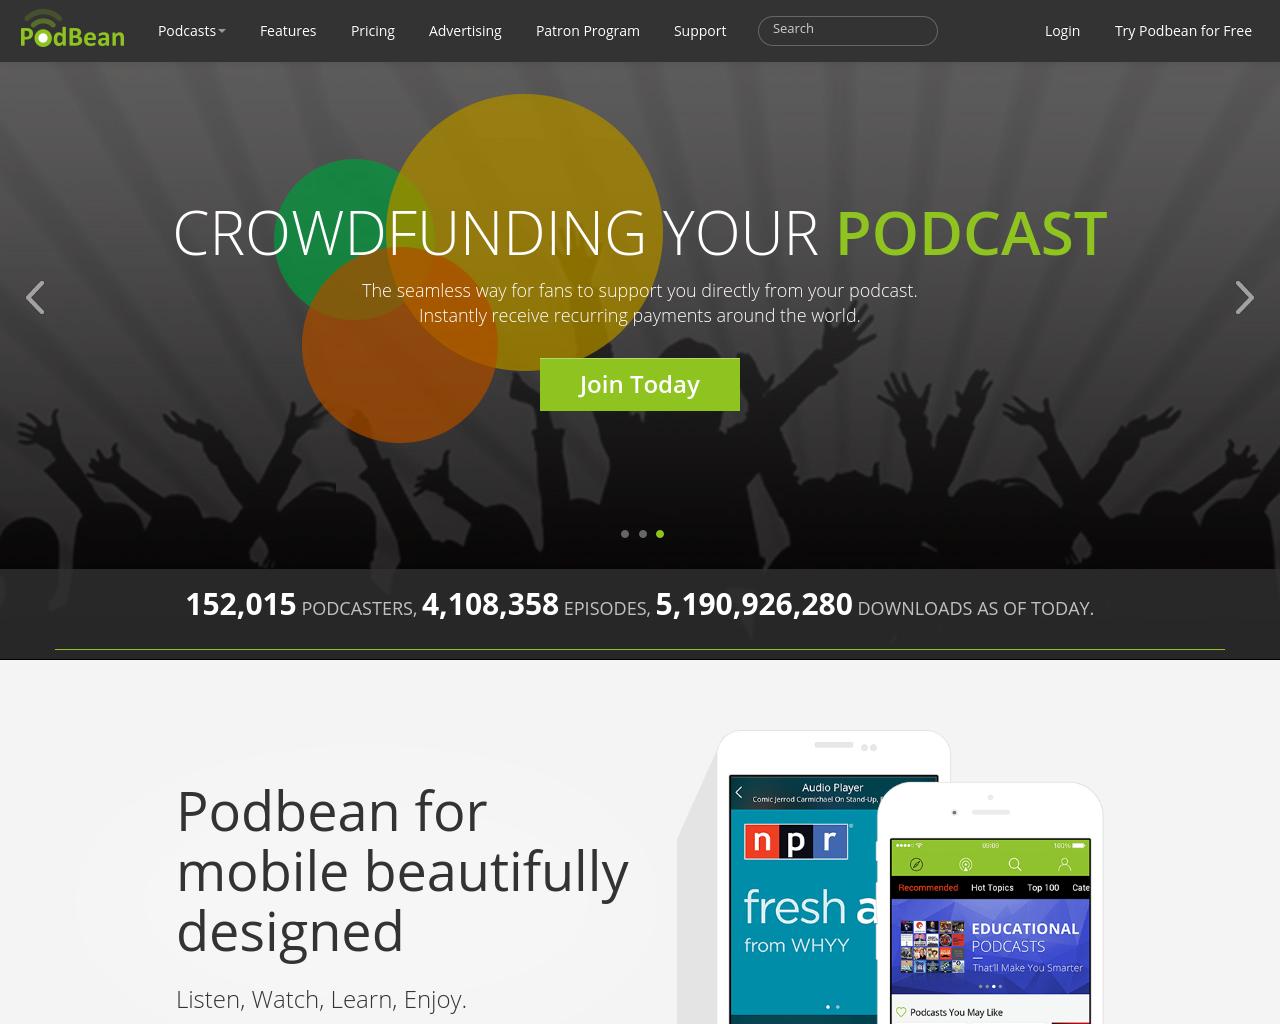 Podbean-Advertising-Reviews-Pricing